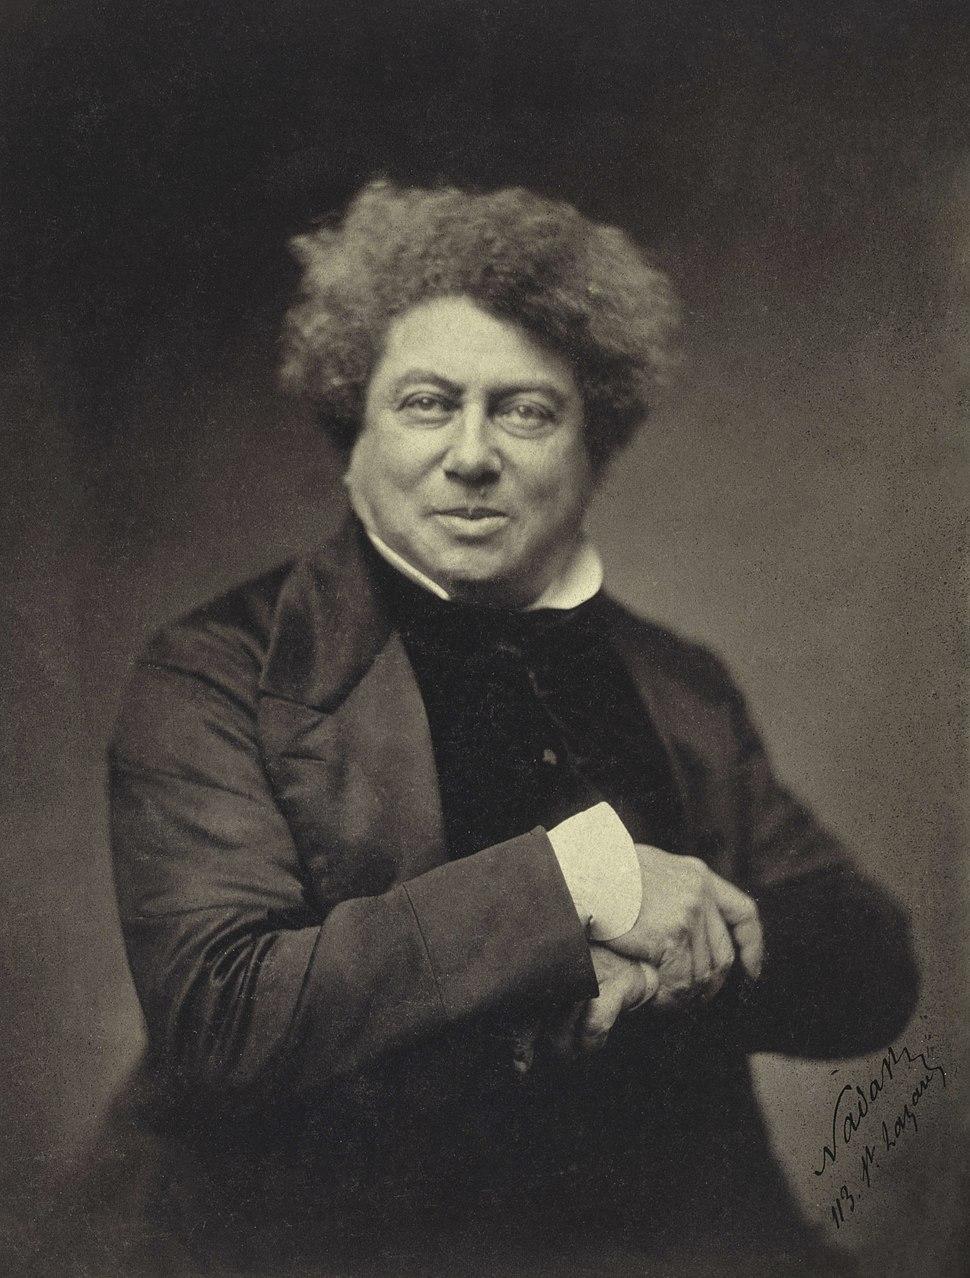 Nadar - Alexander Dumas père (1802-1870) - Google Art Project 2